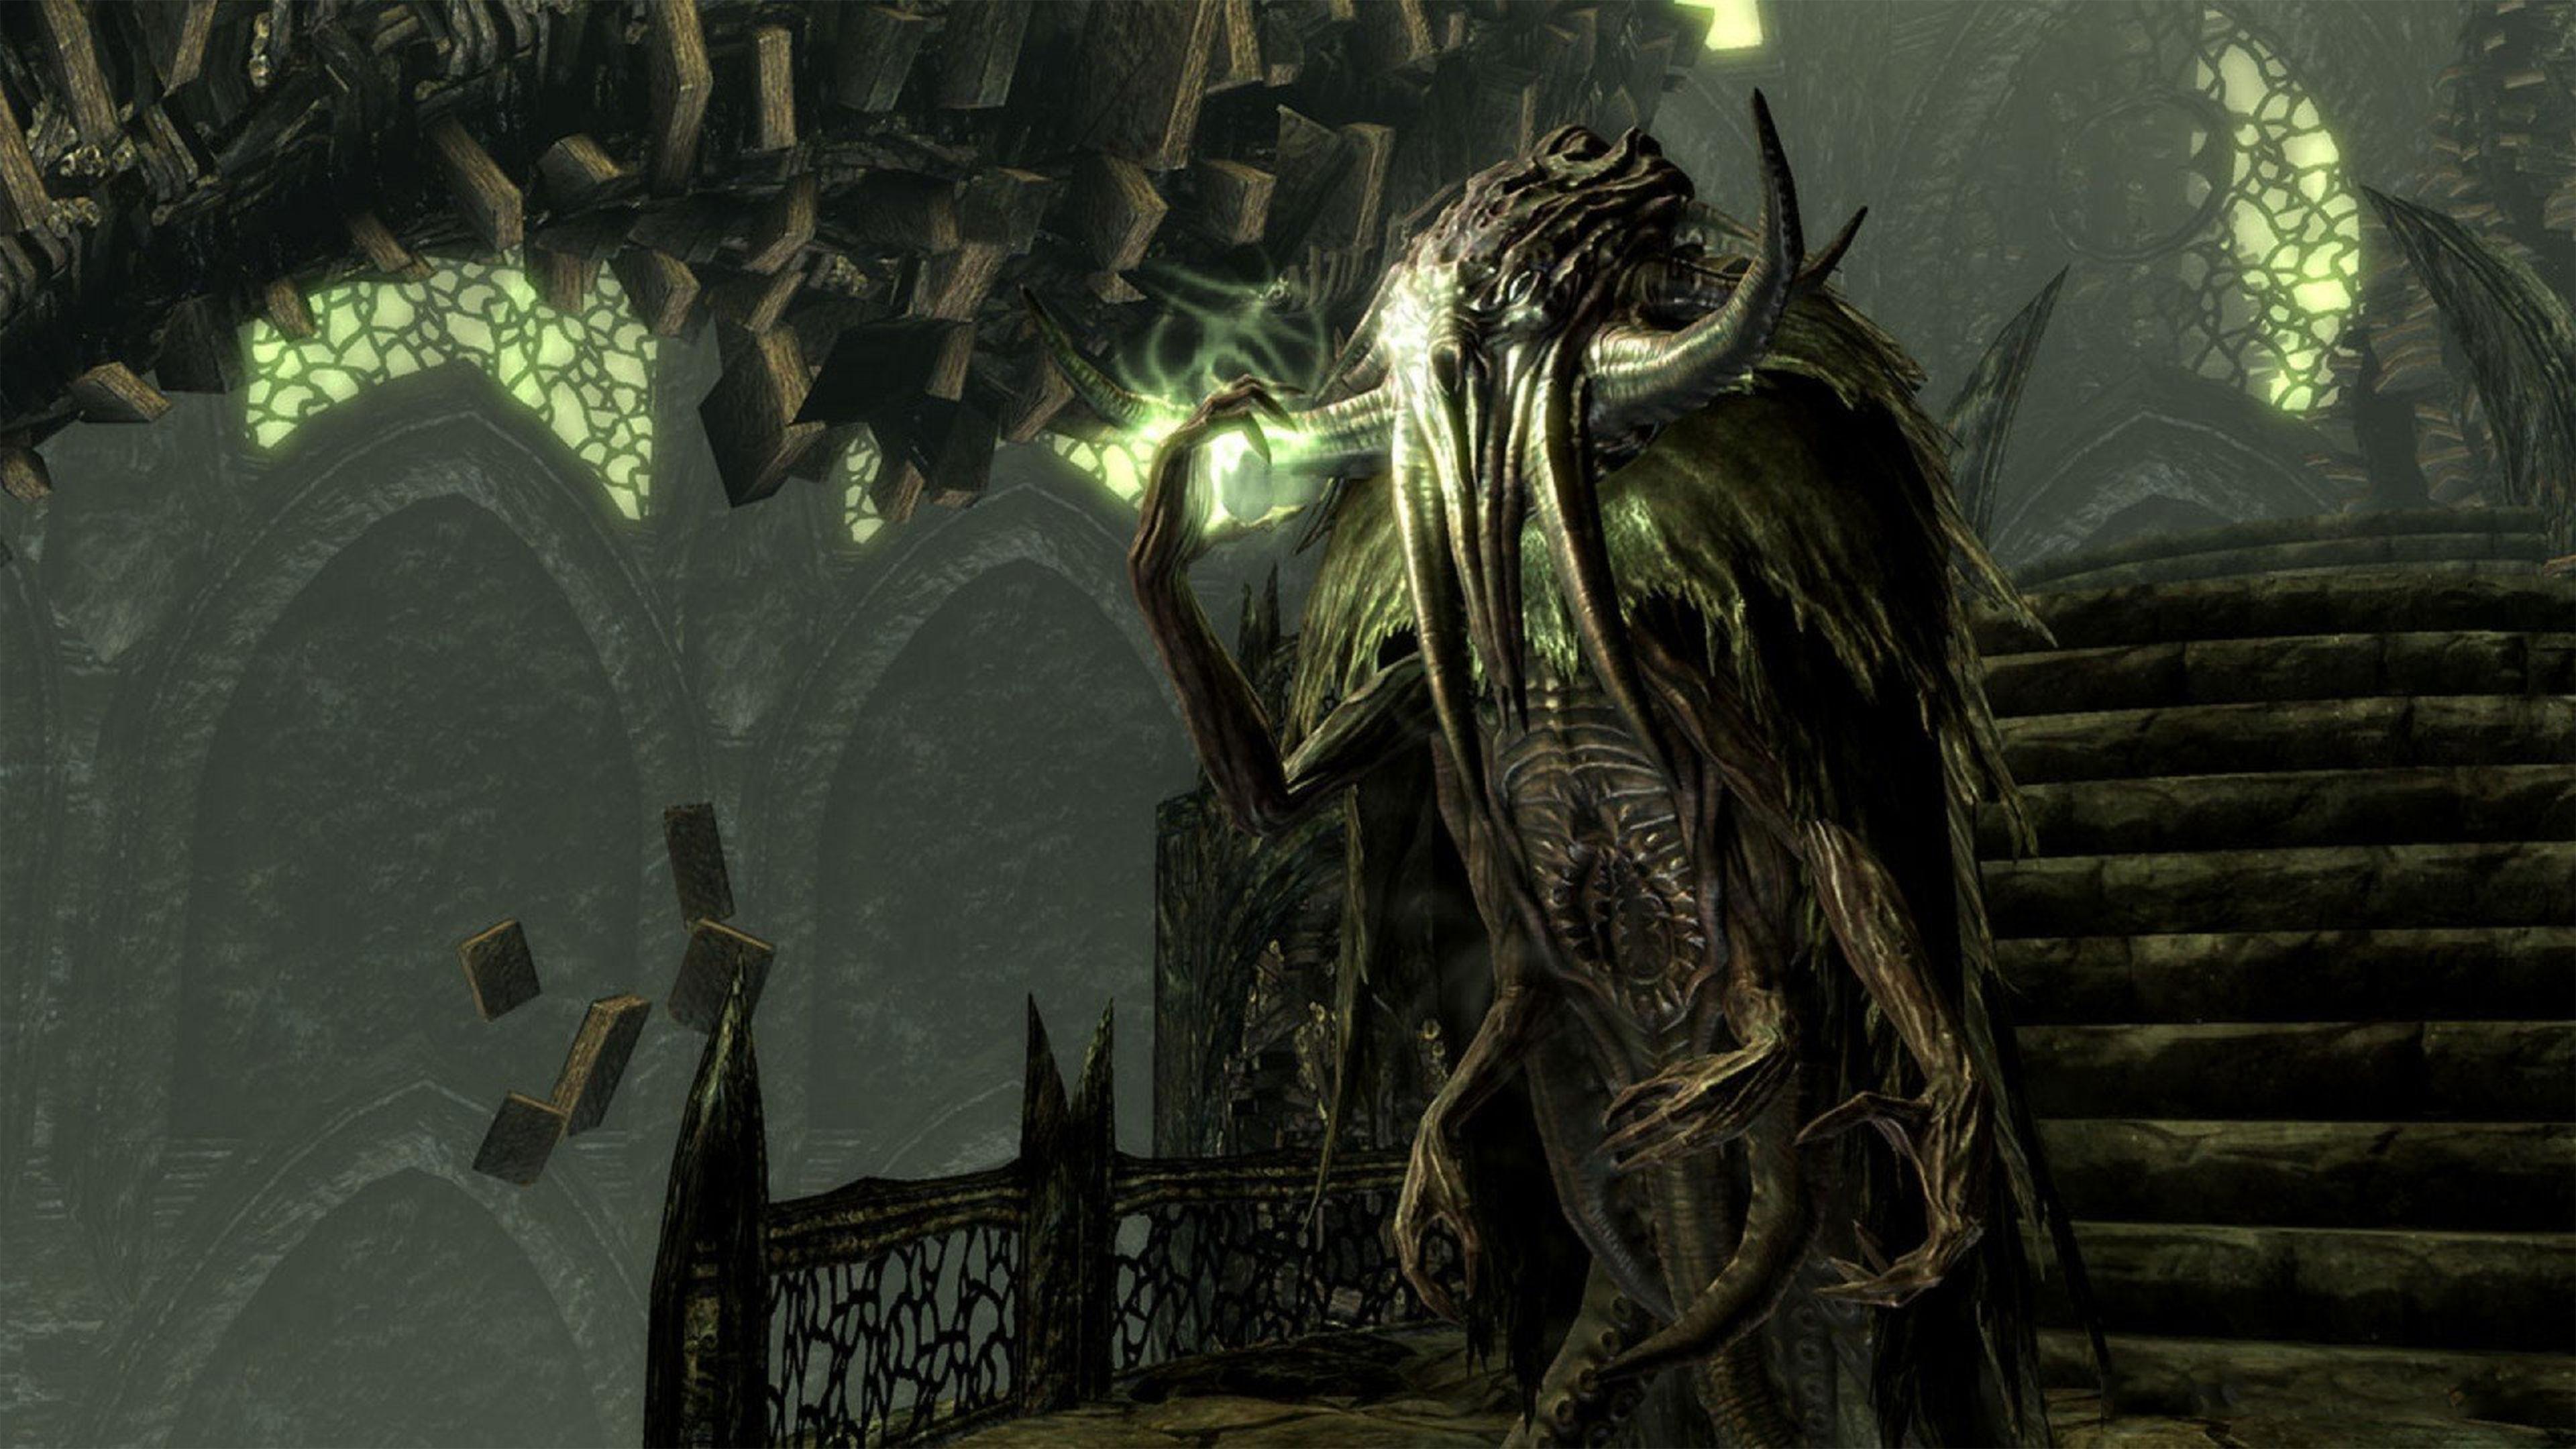 Lord Cthulhu